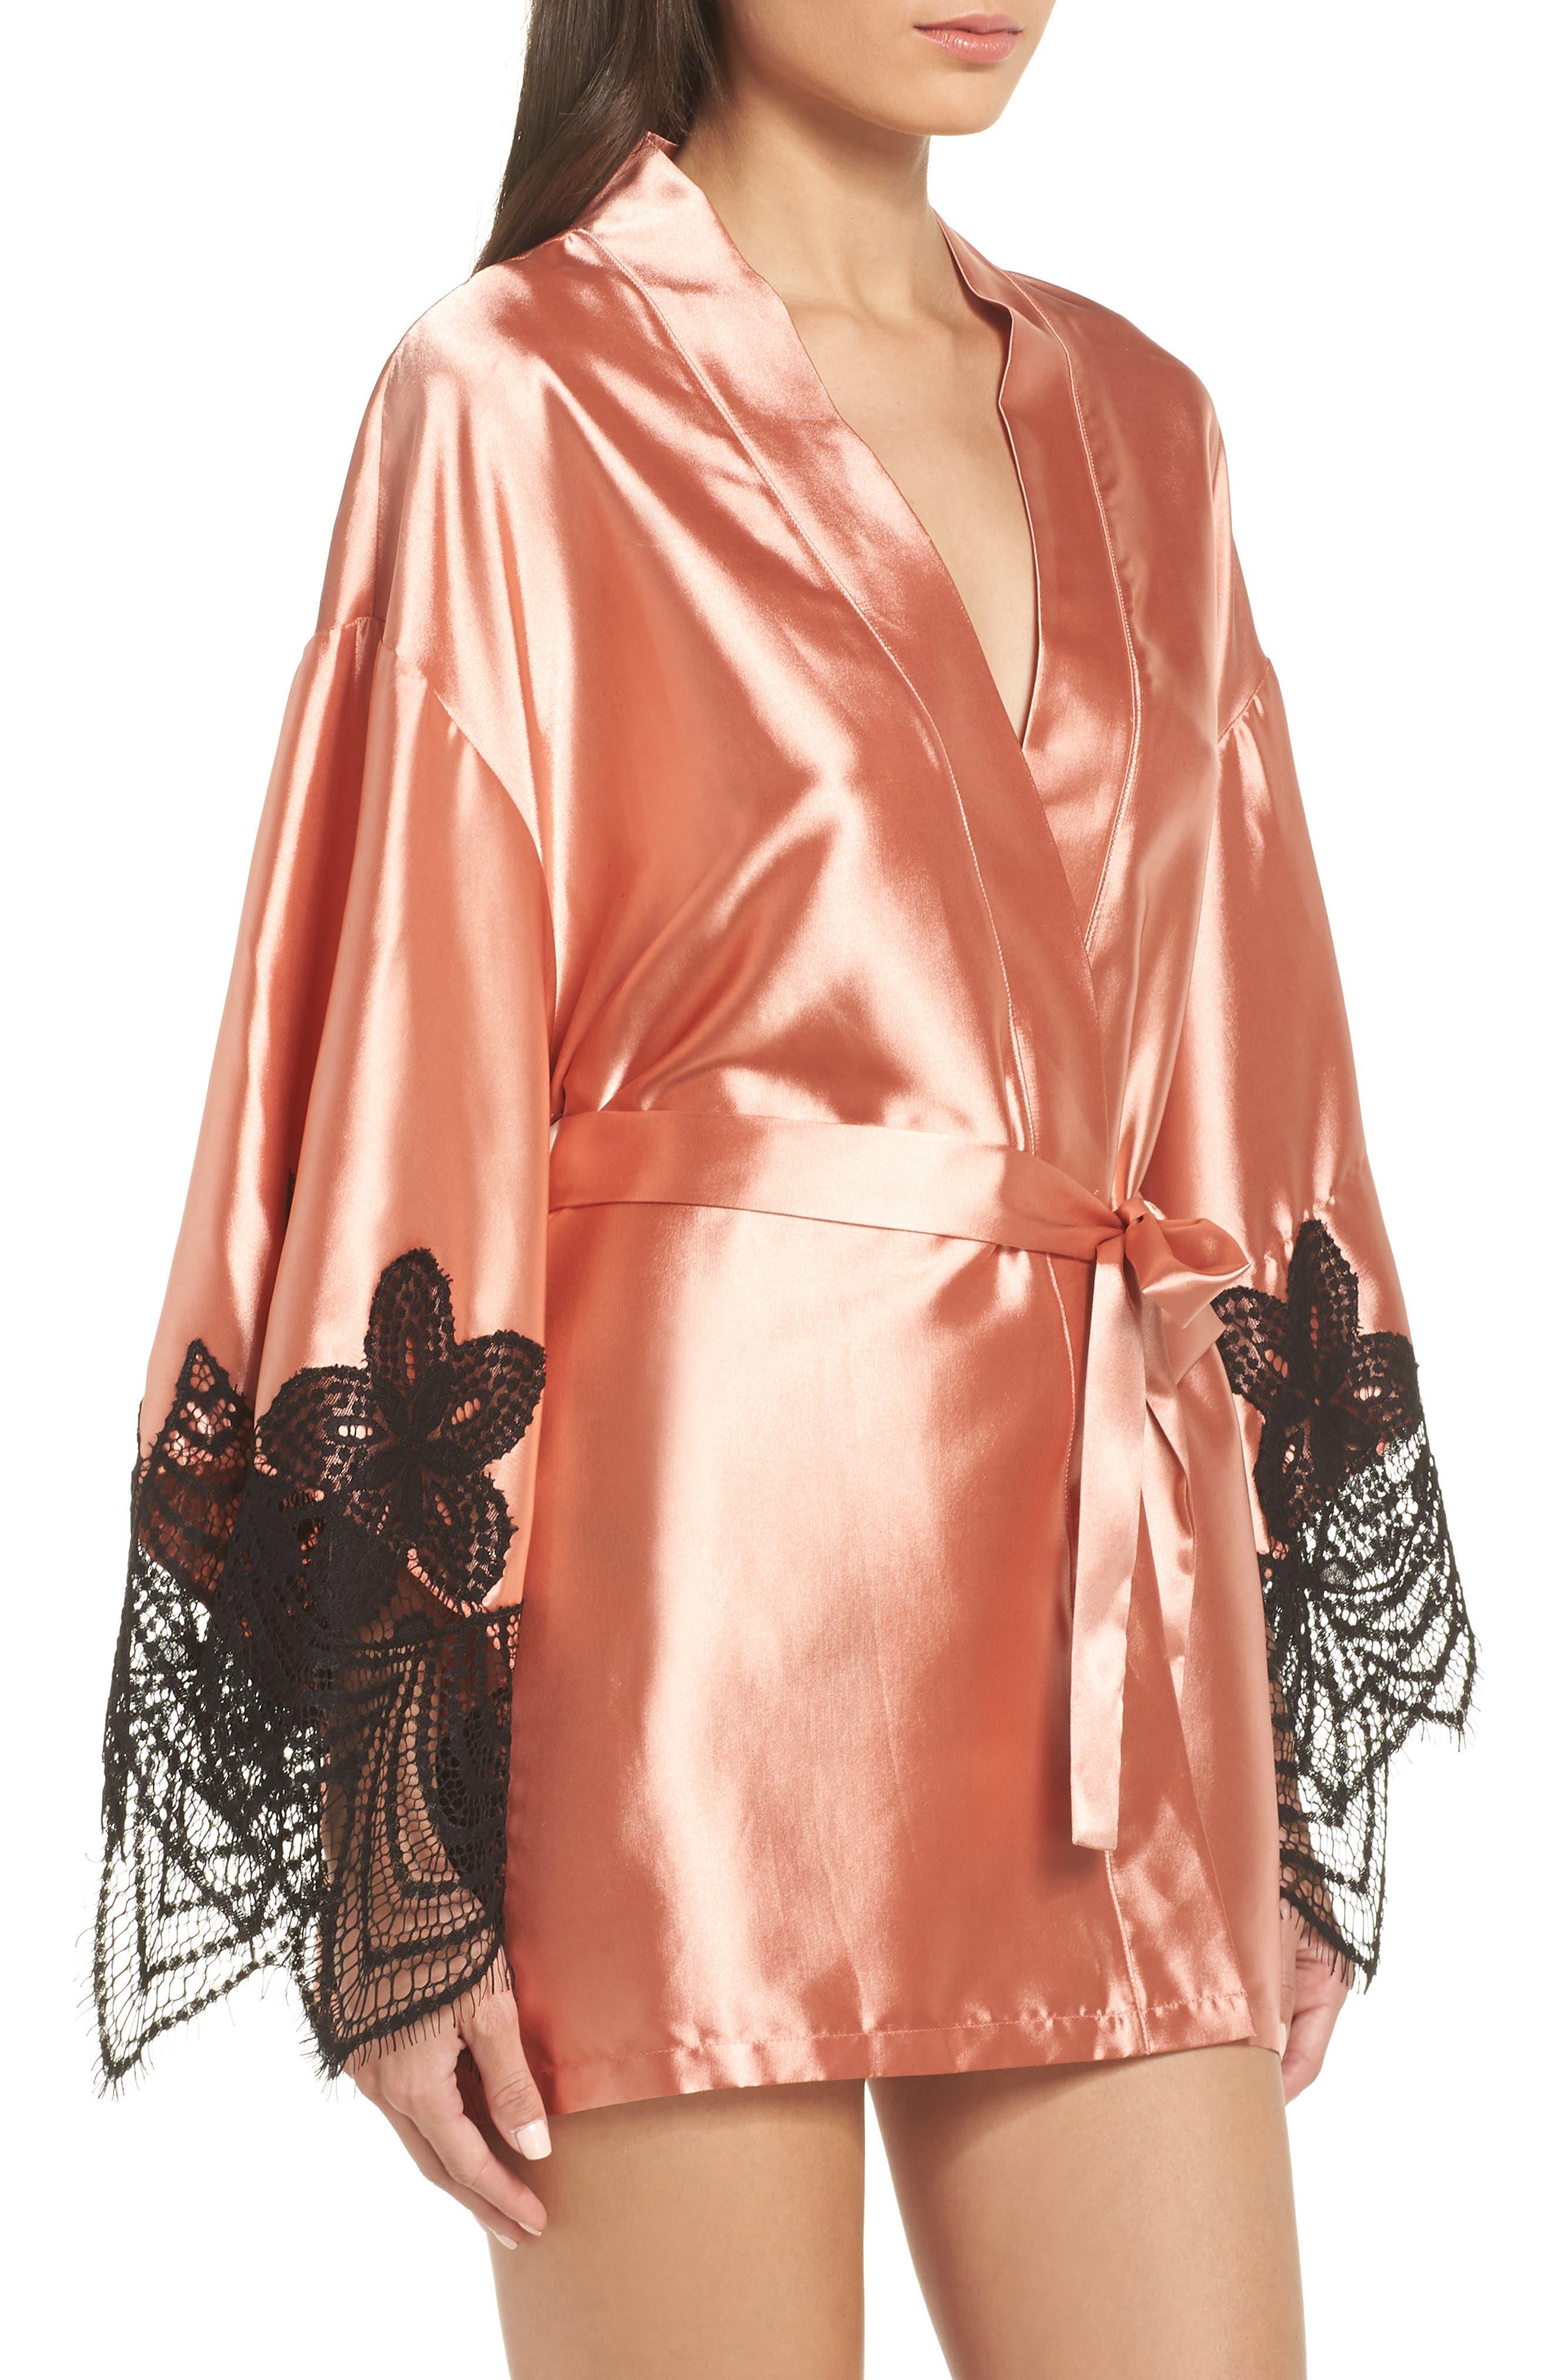 Drama Lace Trim Satin Robe,                             Alternate thumbnail 3, color,                             CAMEO BROWN/ BLACK